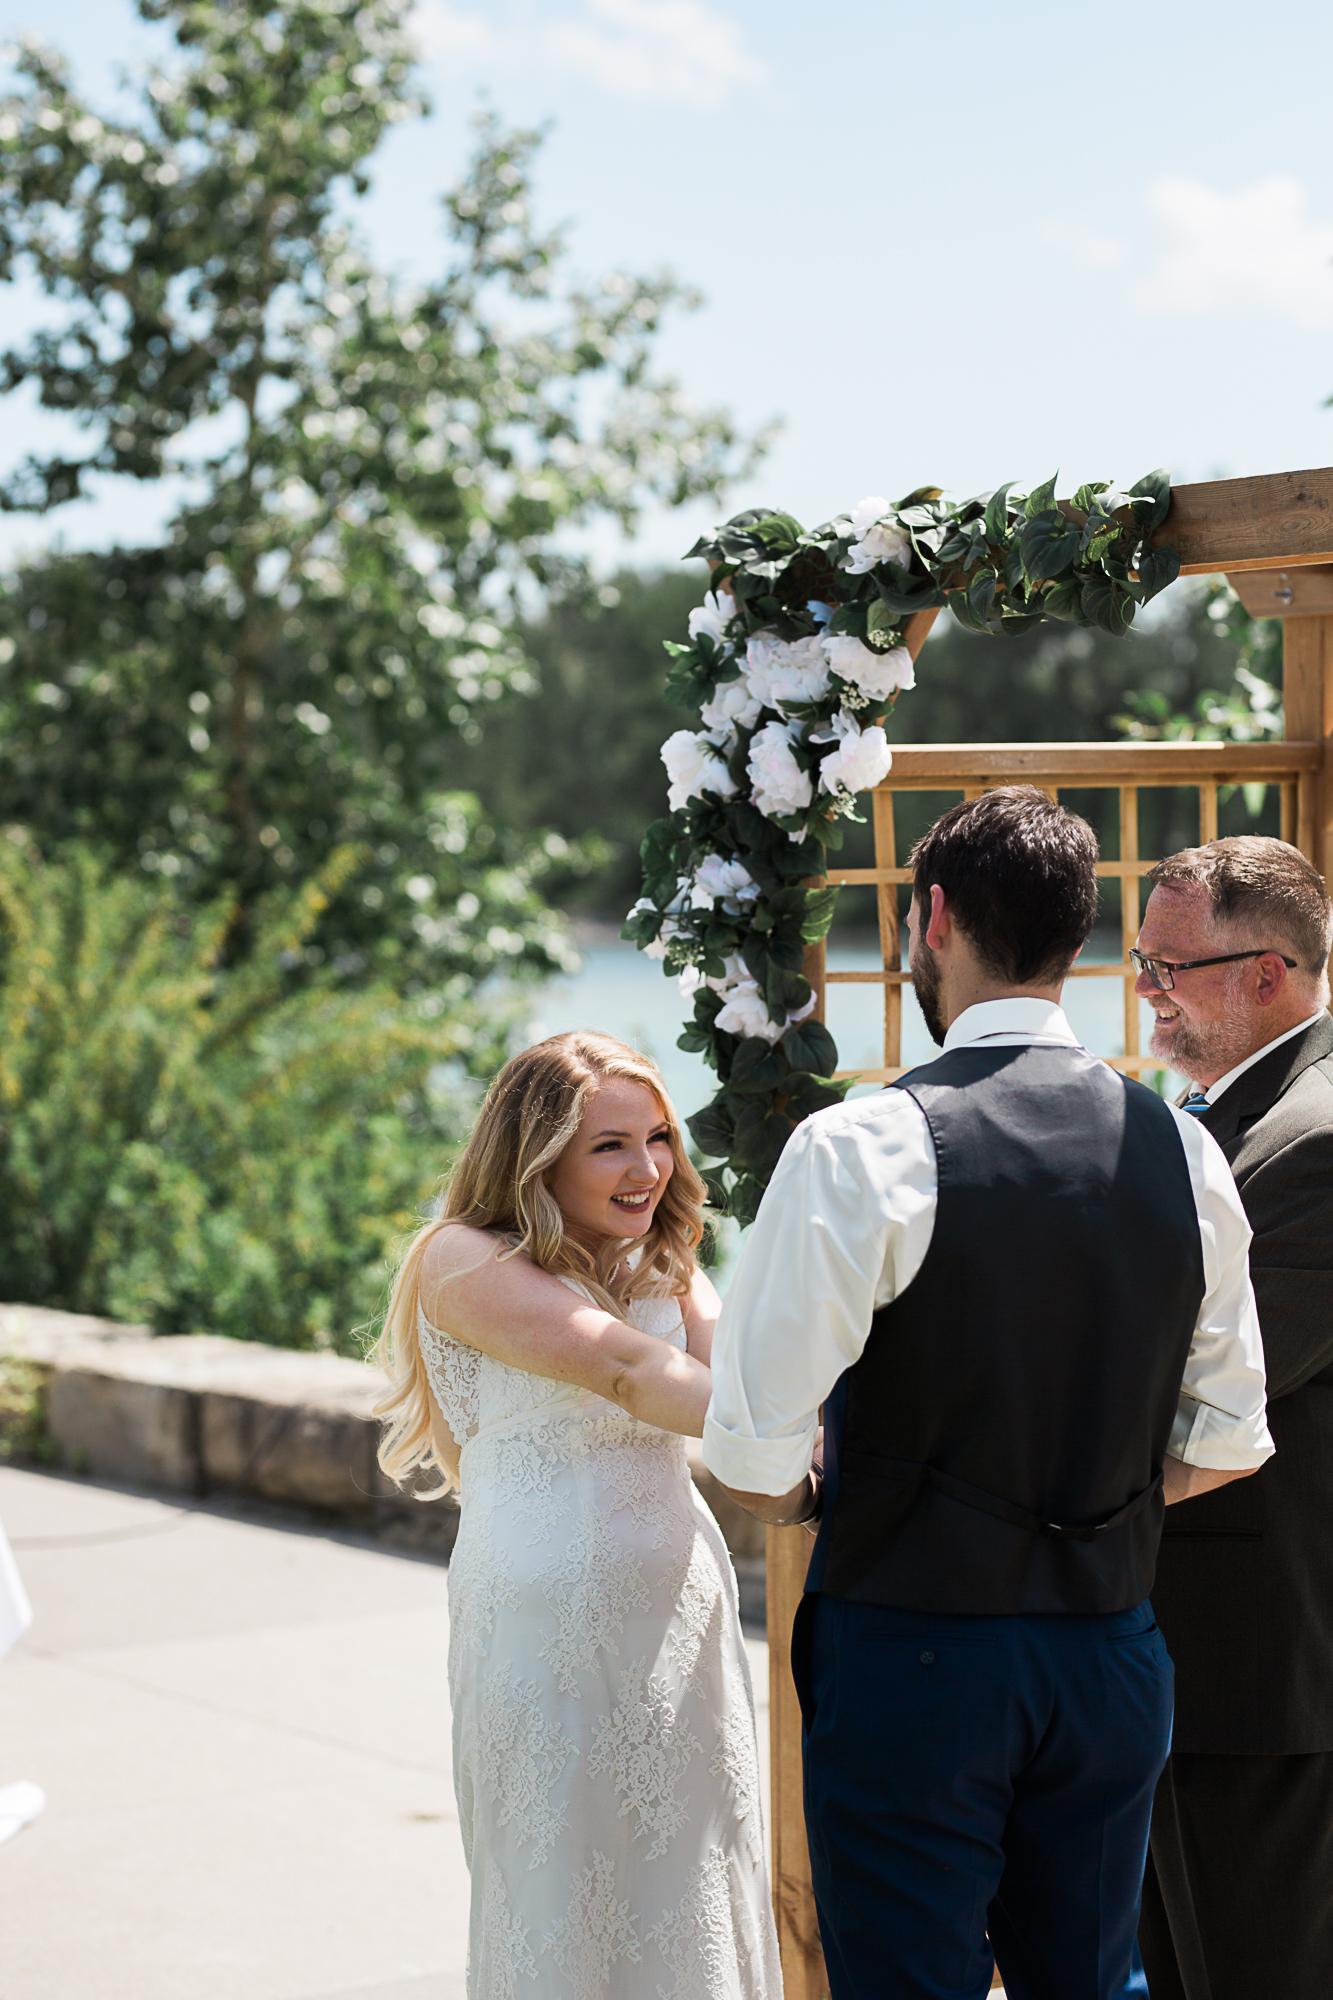 Baker-park-wedding-AC-35.jpg